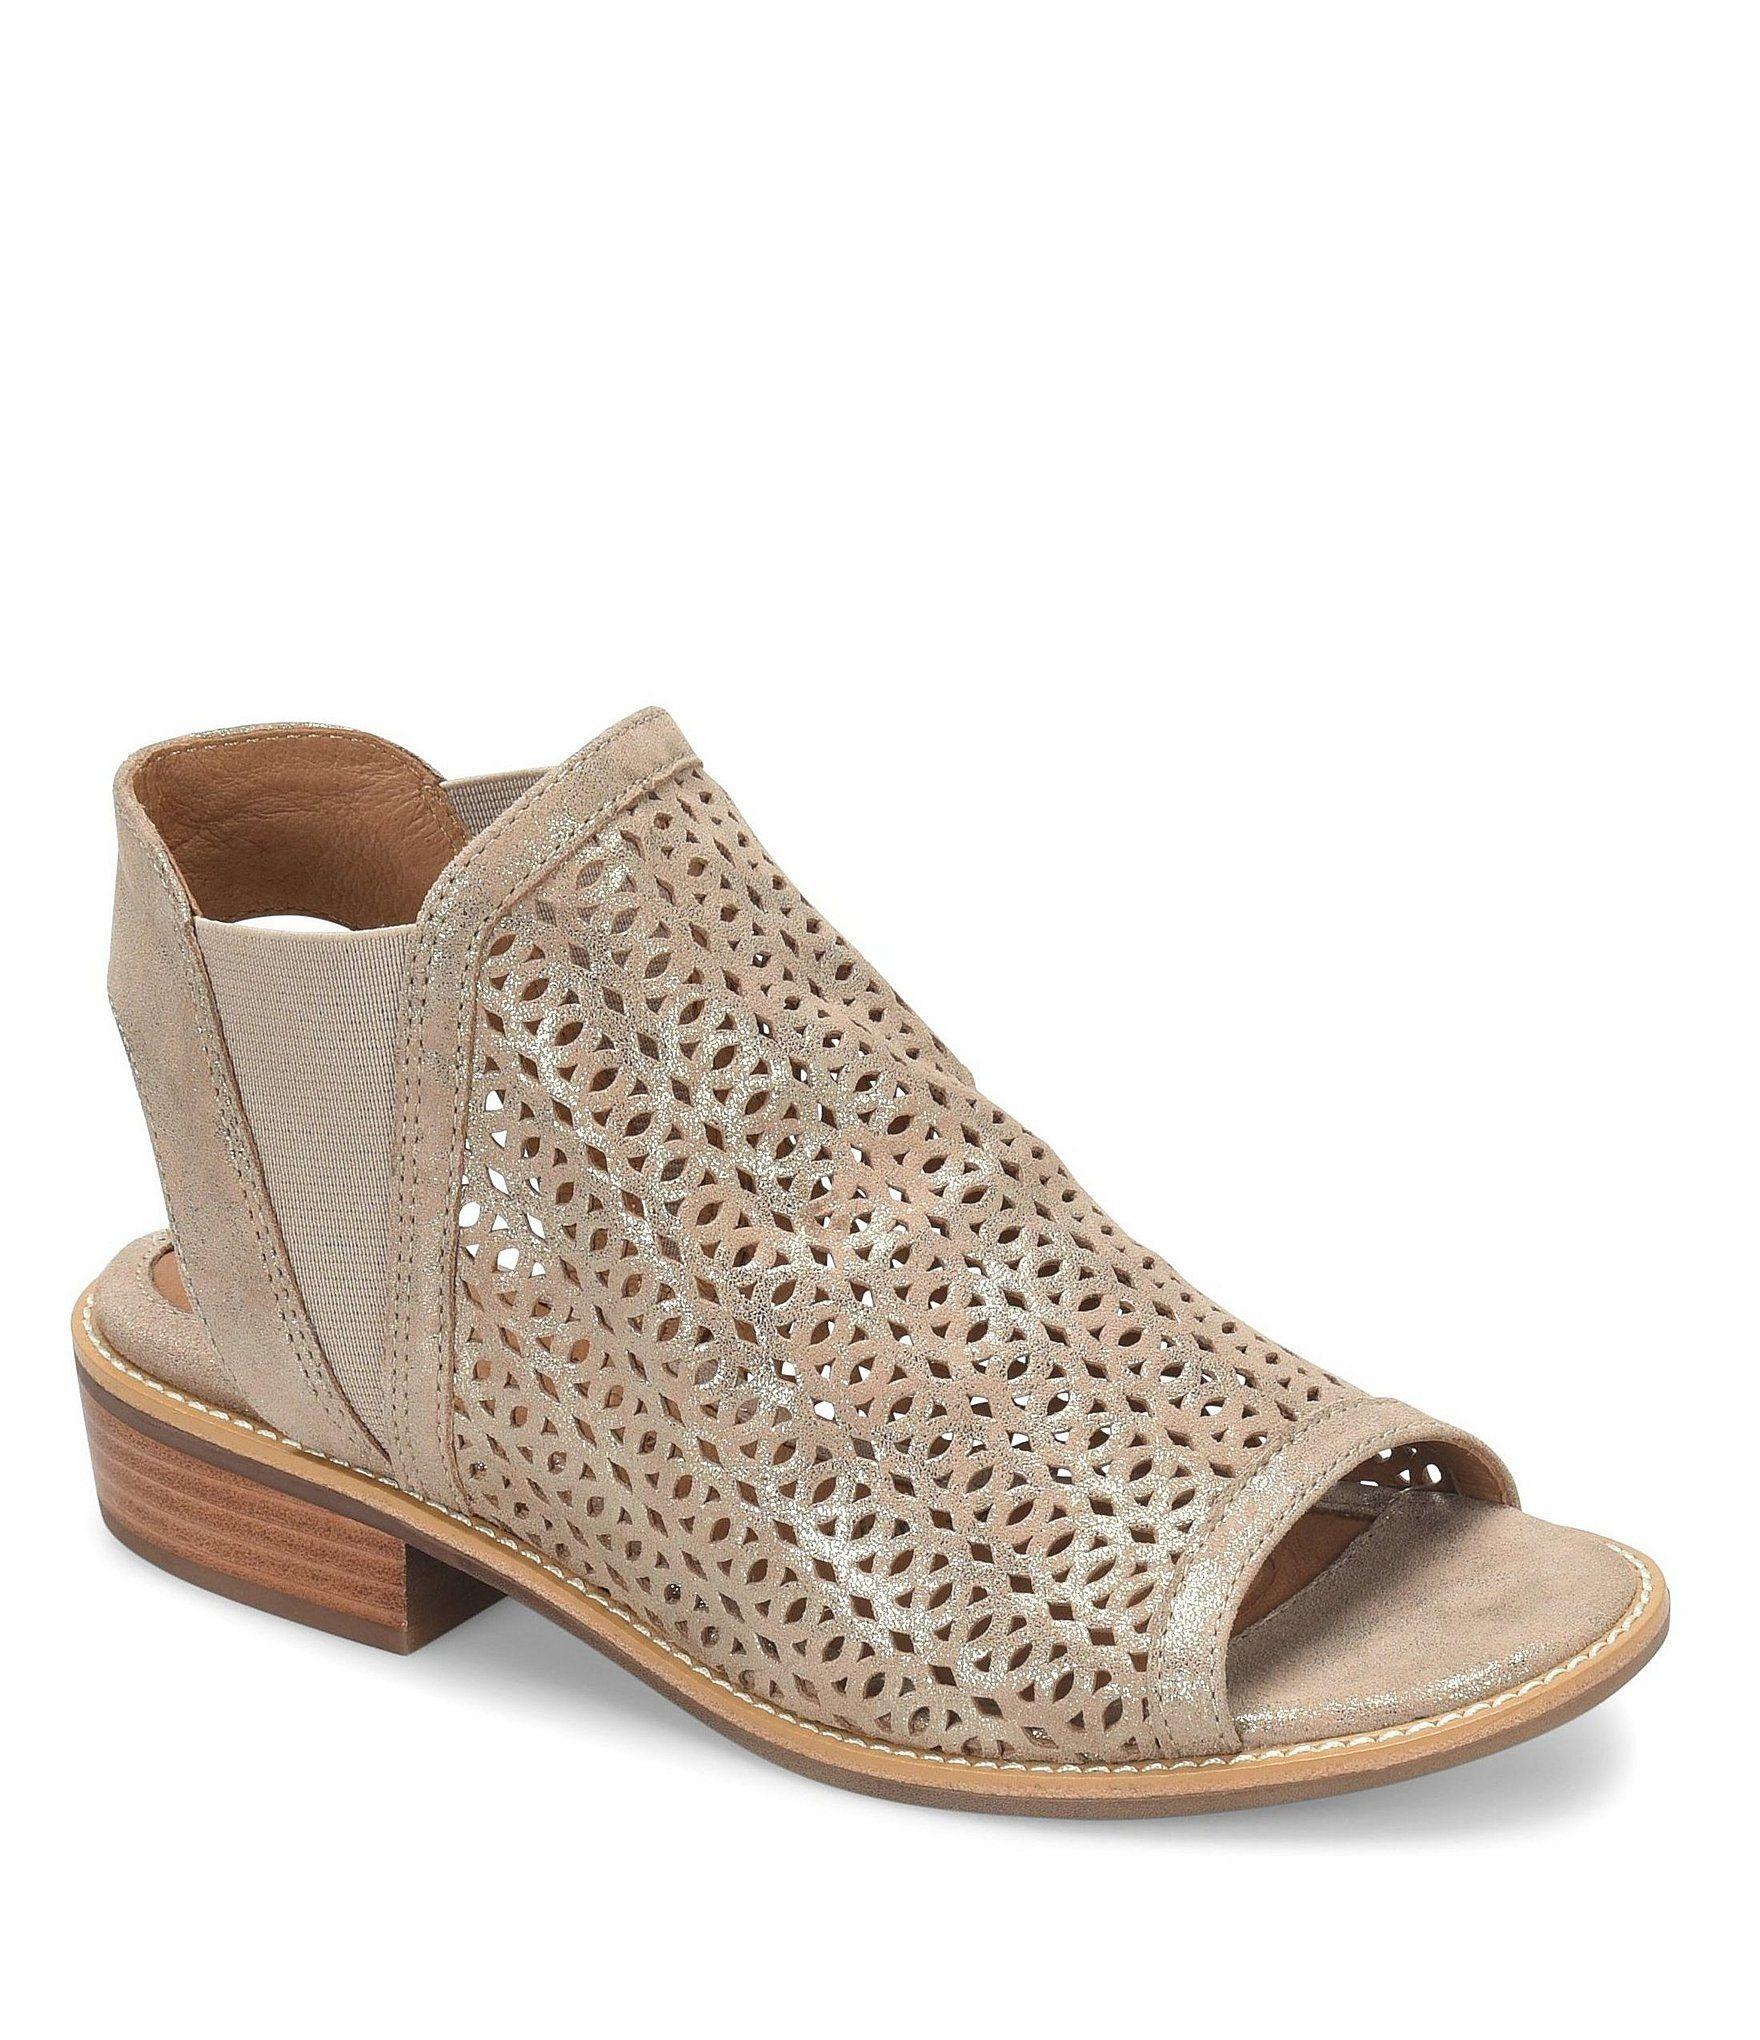 78ebe80aa7f Sofft Nalda Distressed Foil Suede Block Heel Sandals